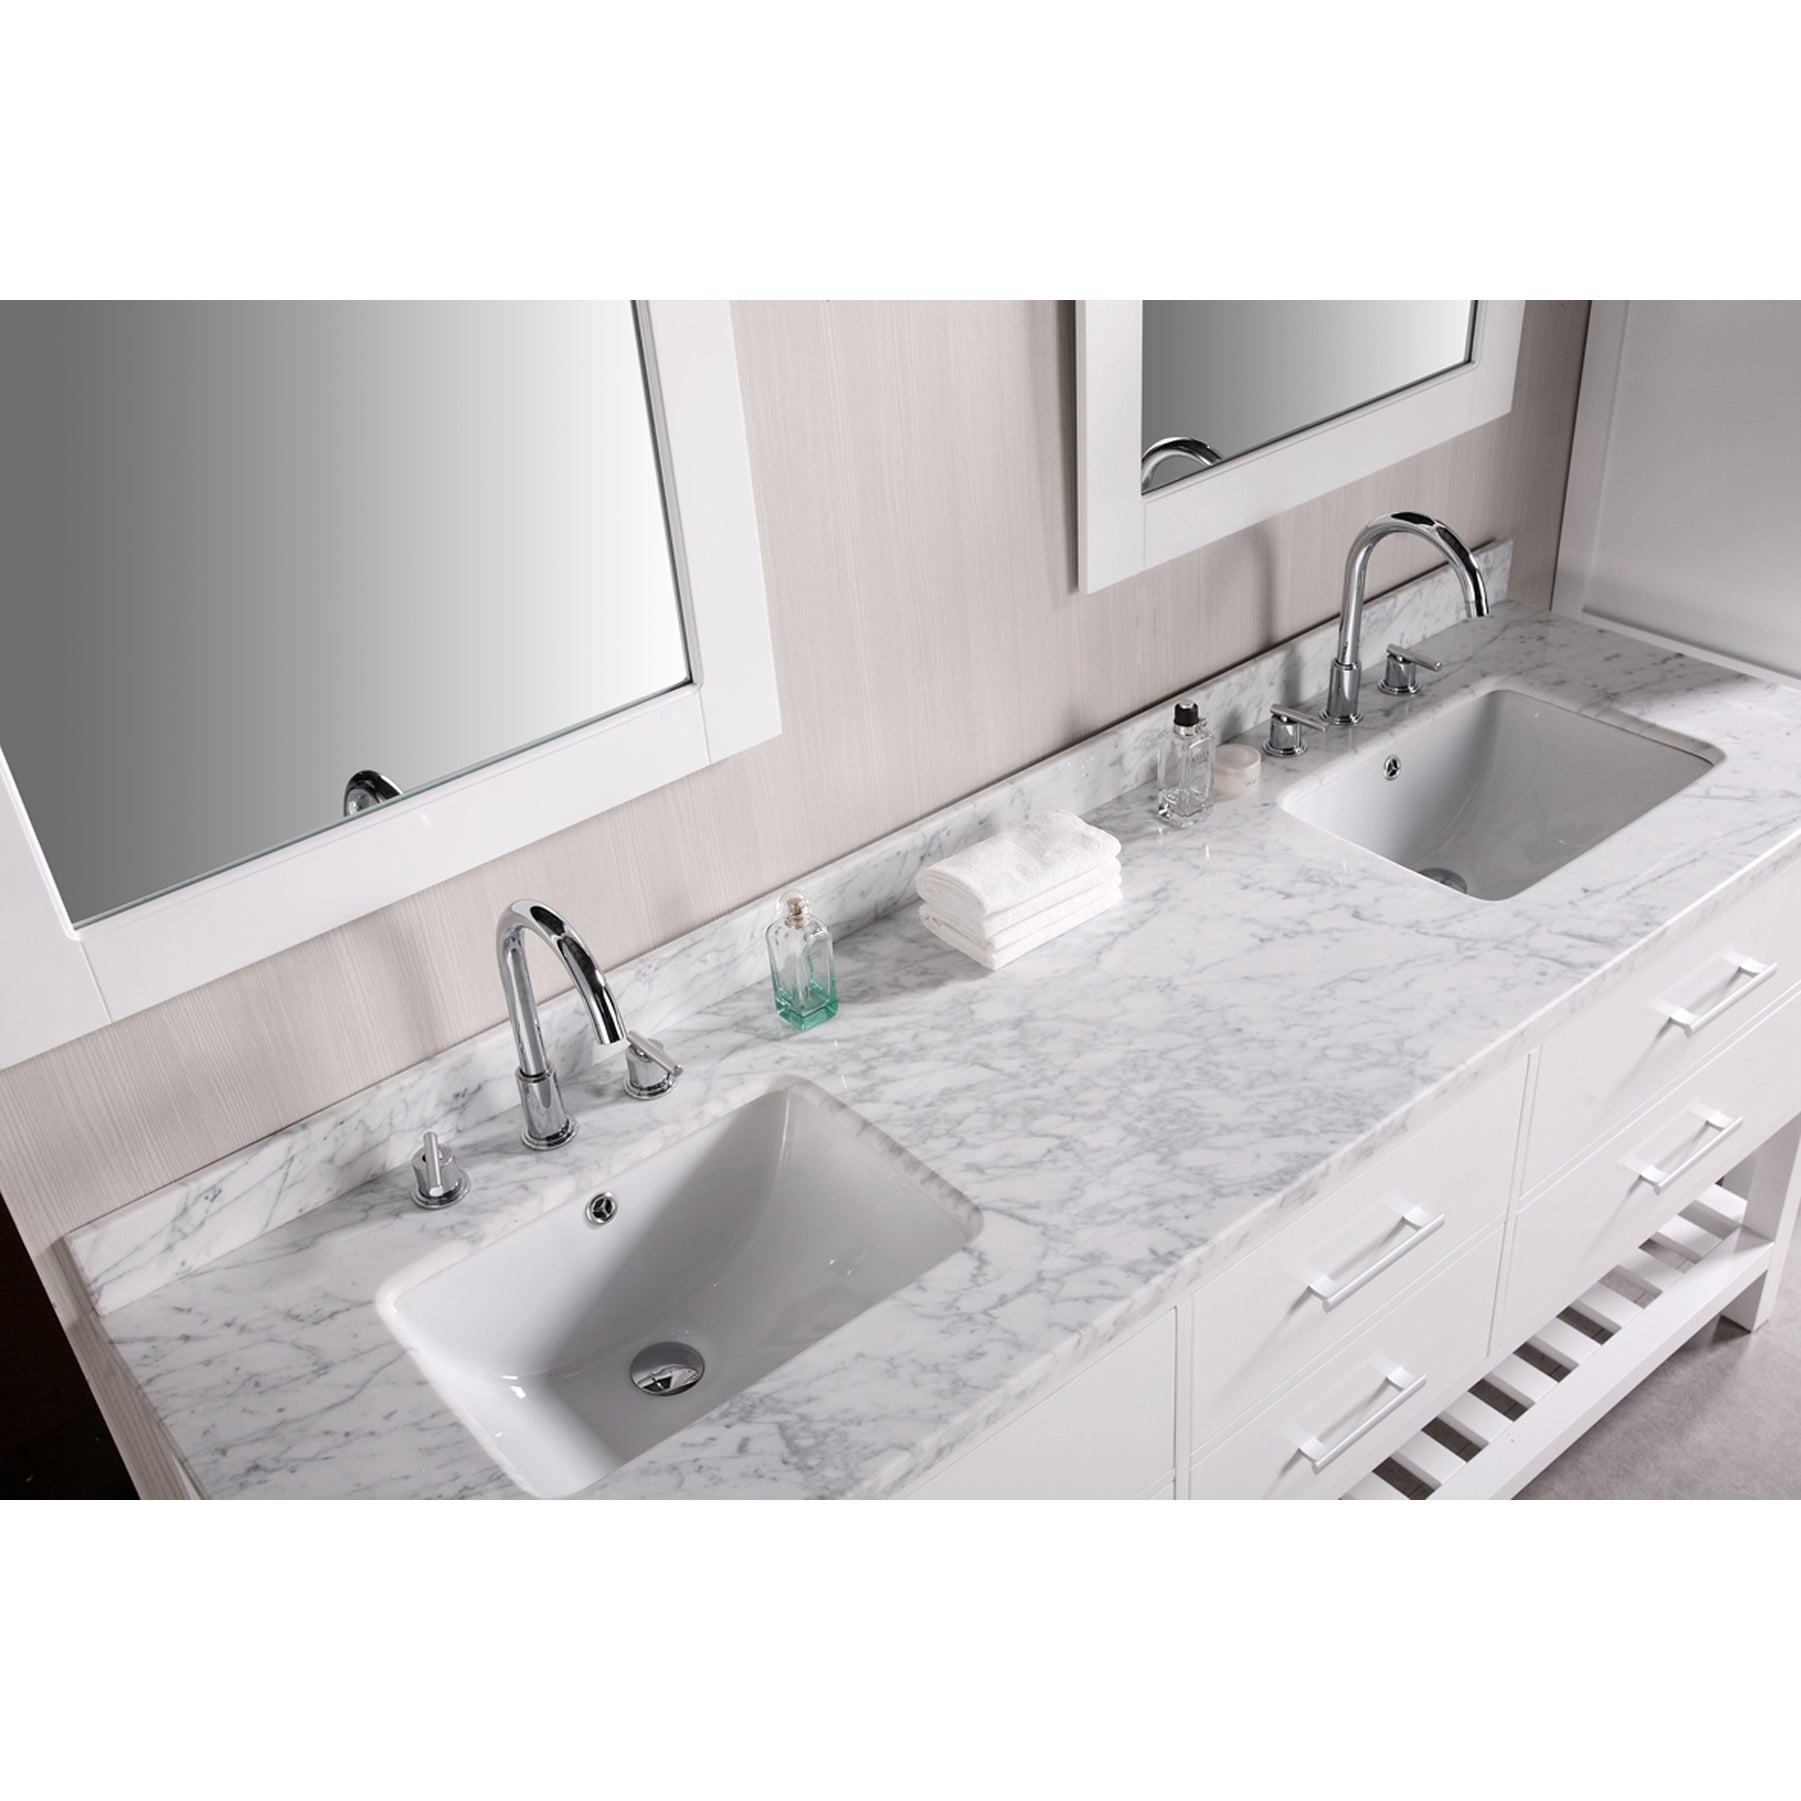 Shop Design Element London 72-inch Double Sink Bathroom Vanity Set ...